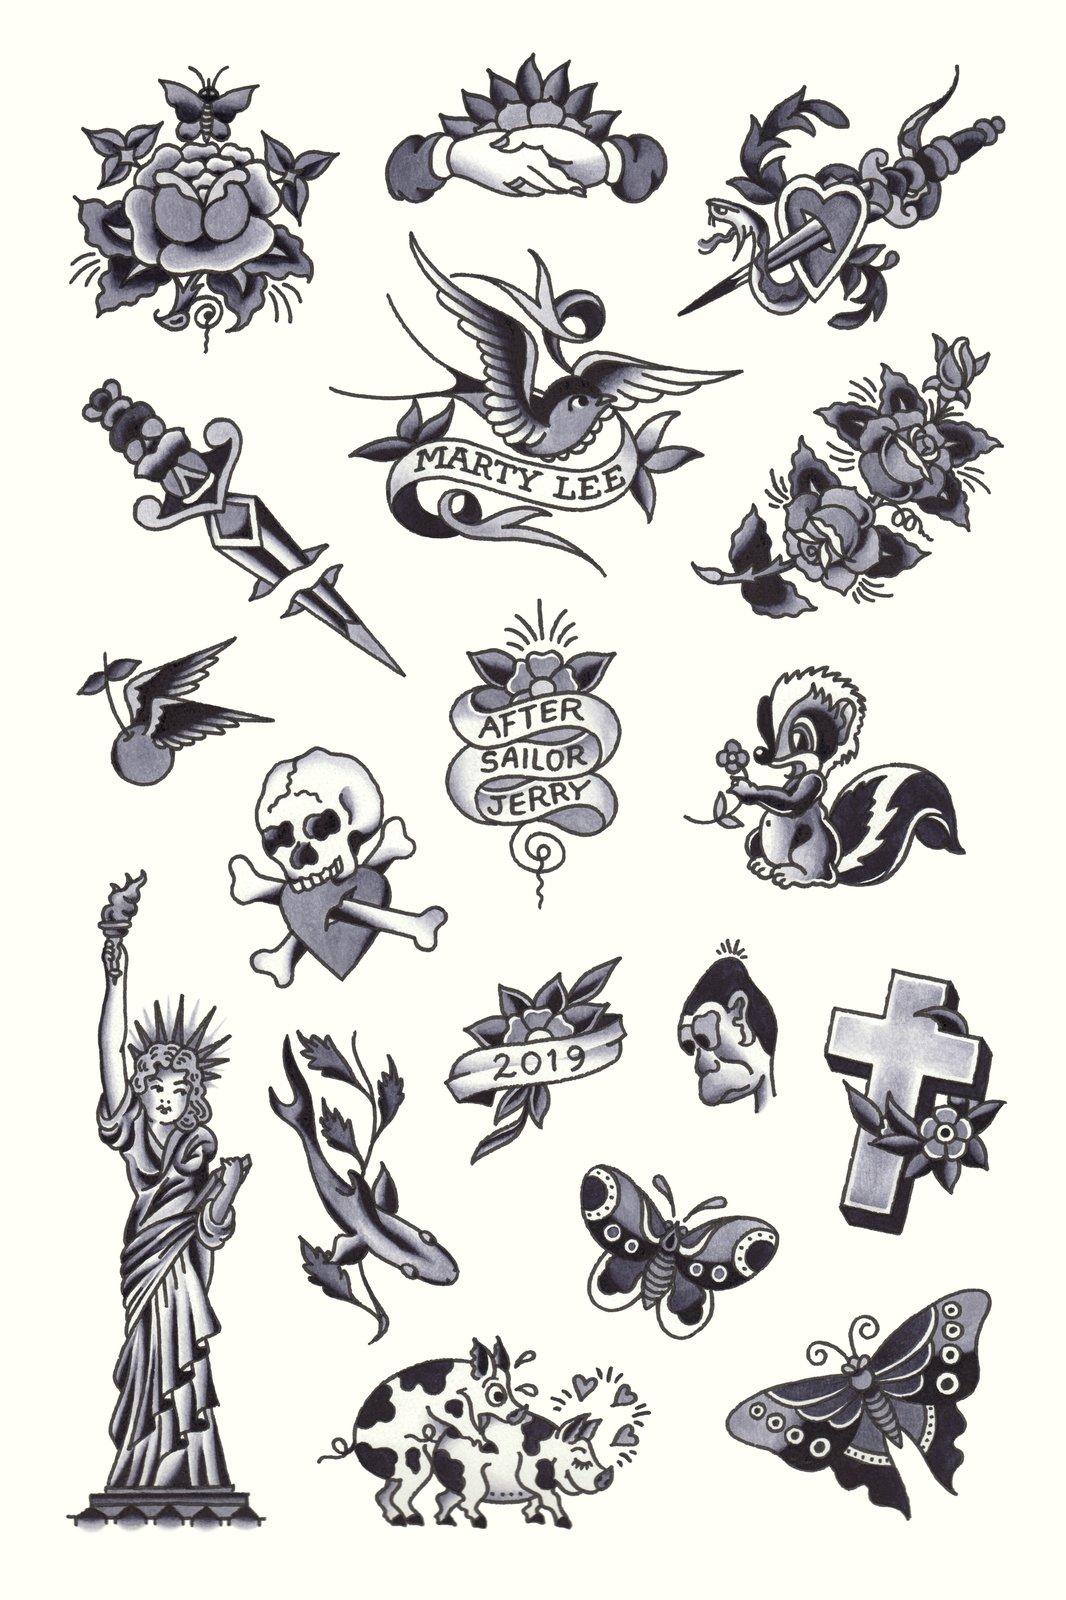 Sailor Jerry Flash Print Marty Lee